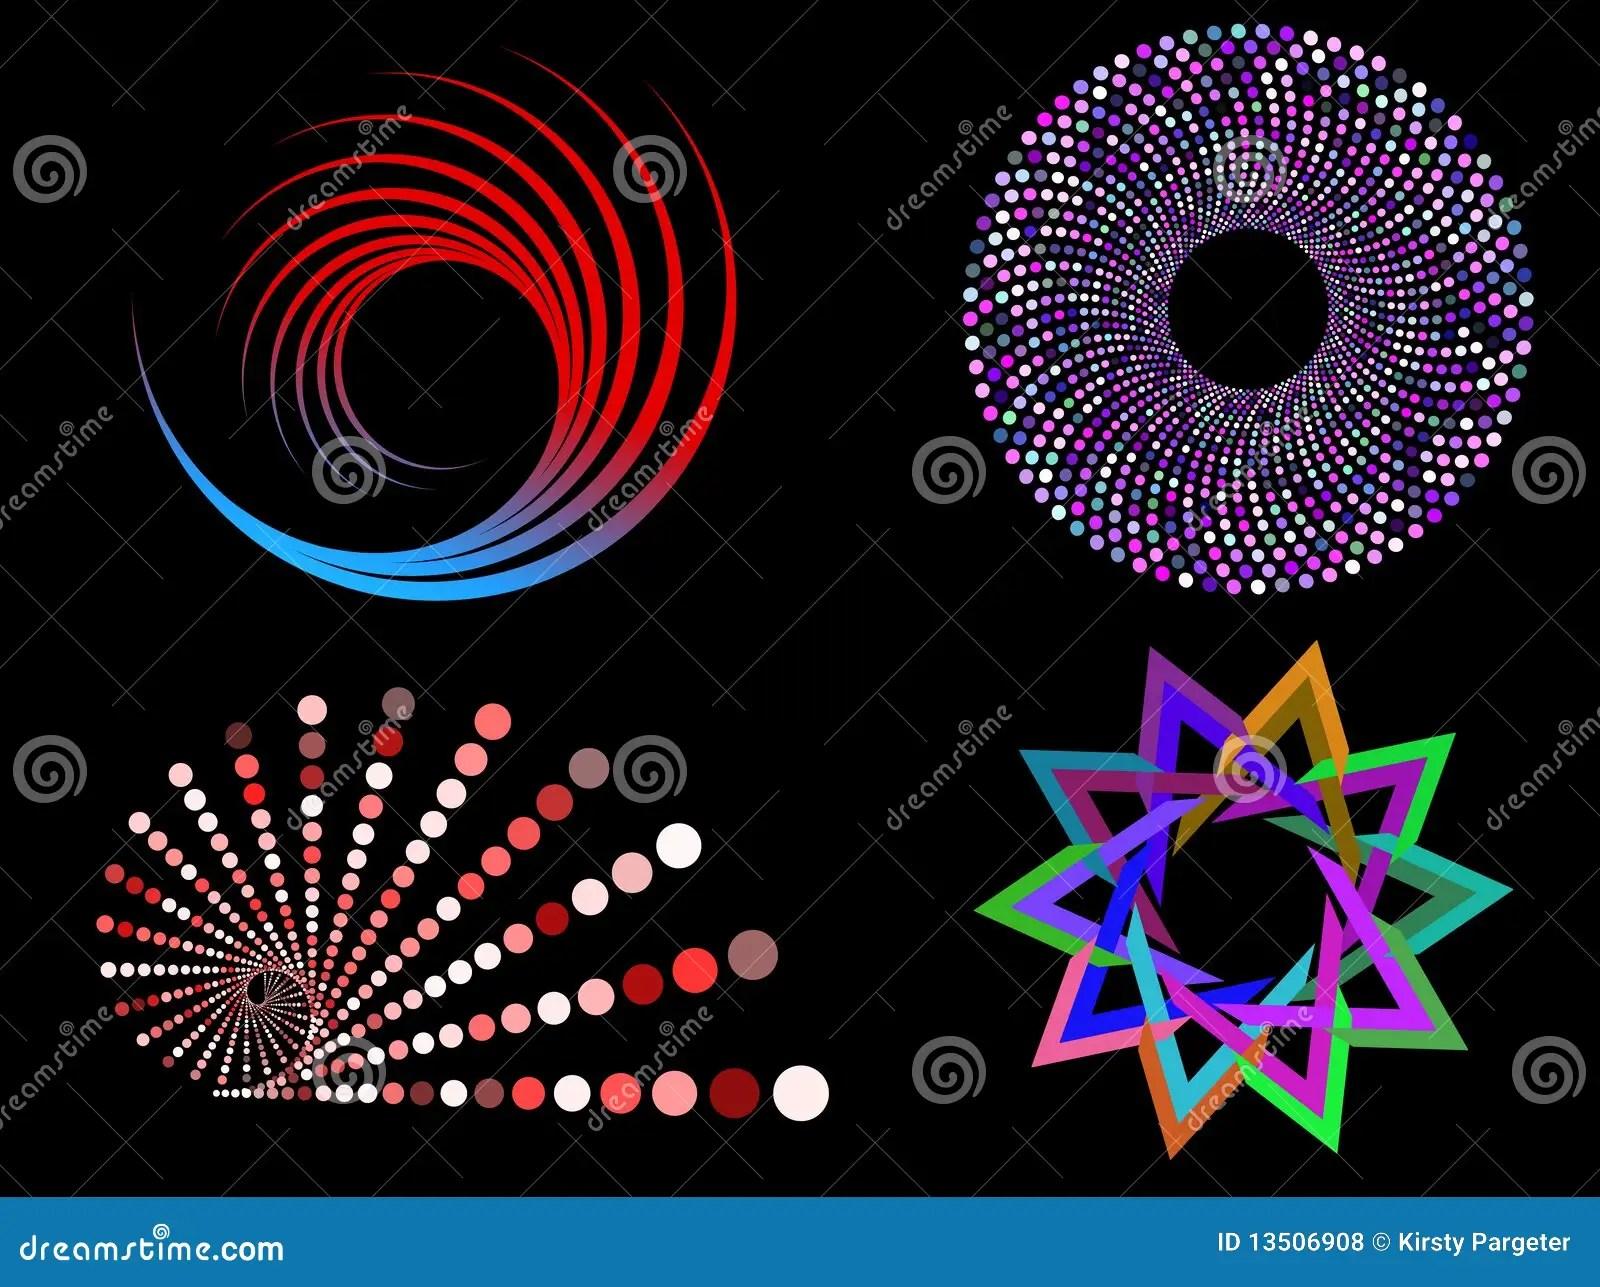 Circular Designs Royalty Free Stock Photos Image 13506908